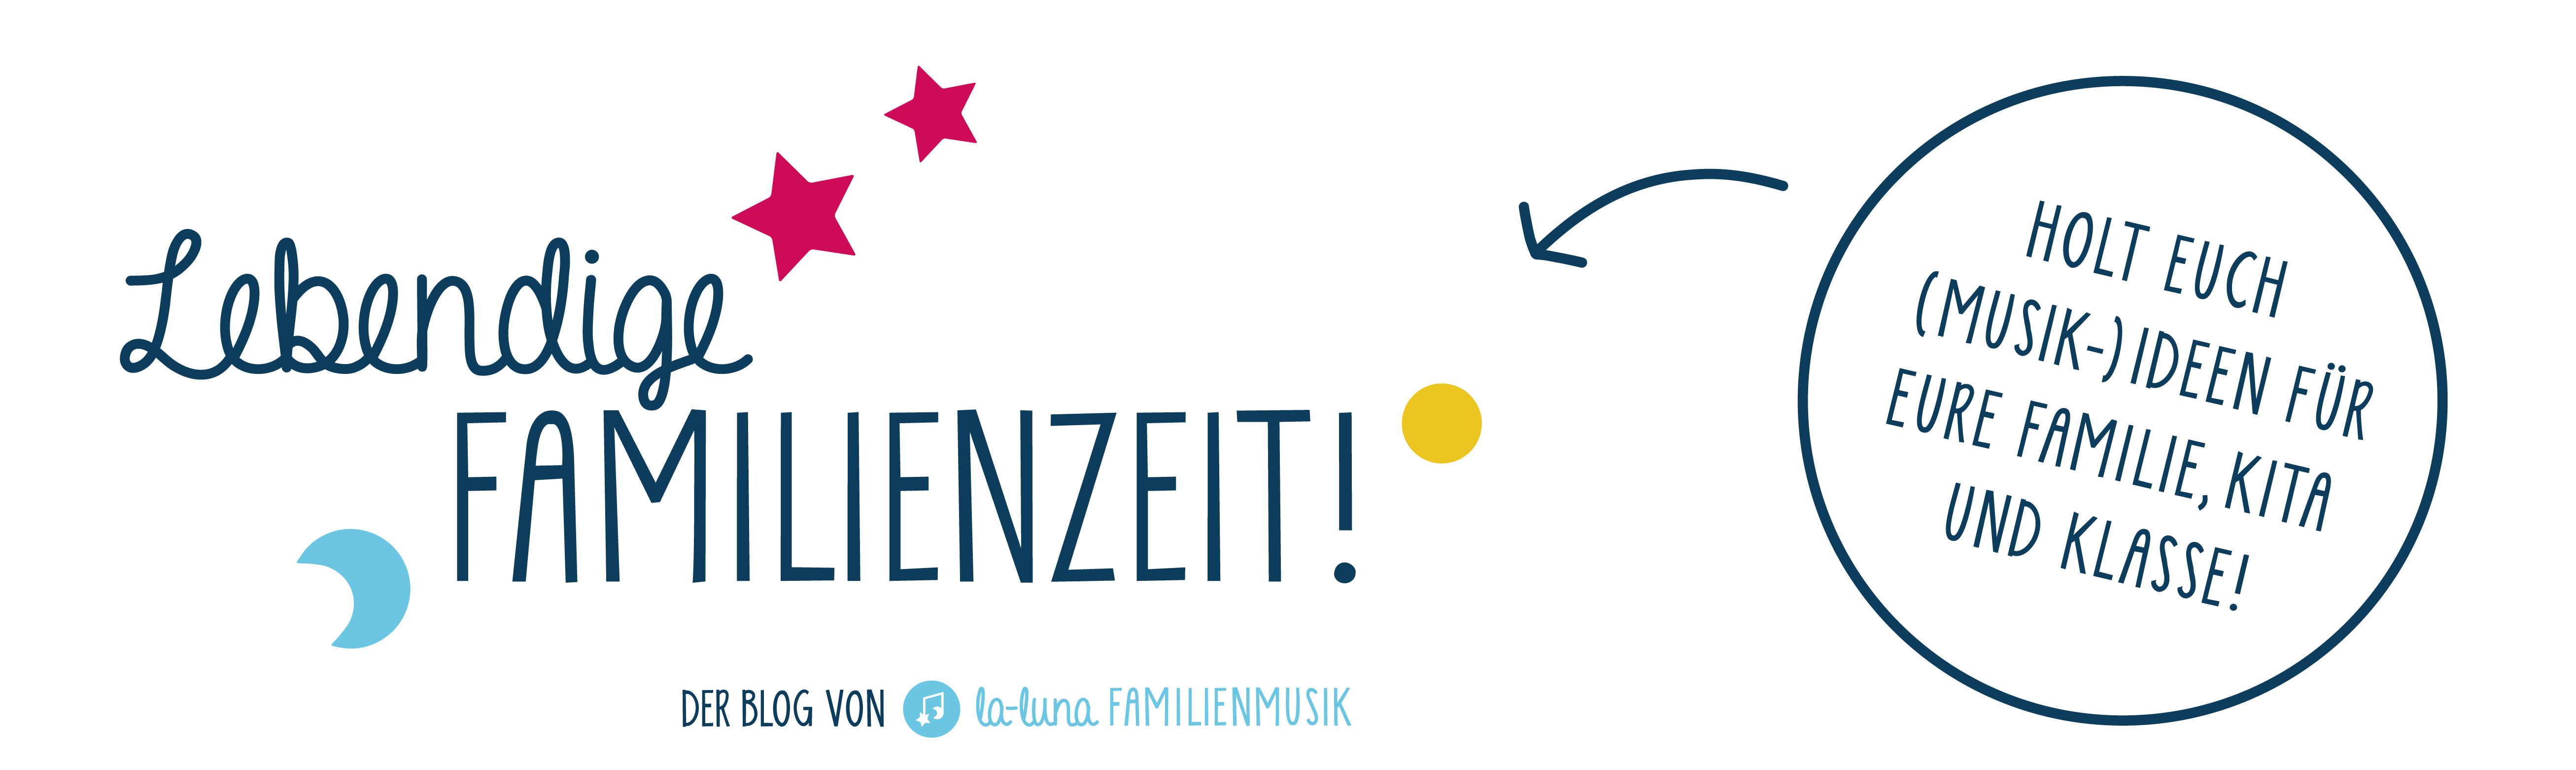 Lebendige Familienzeit by la-luna-Familienmusik